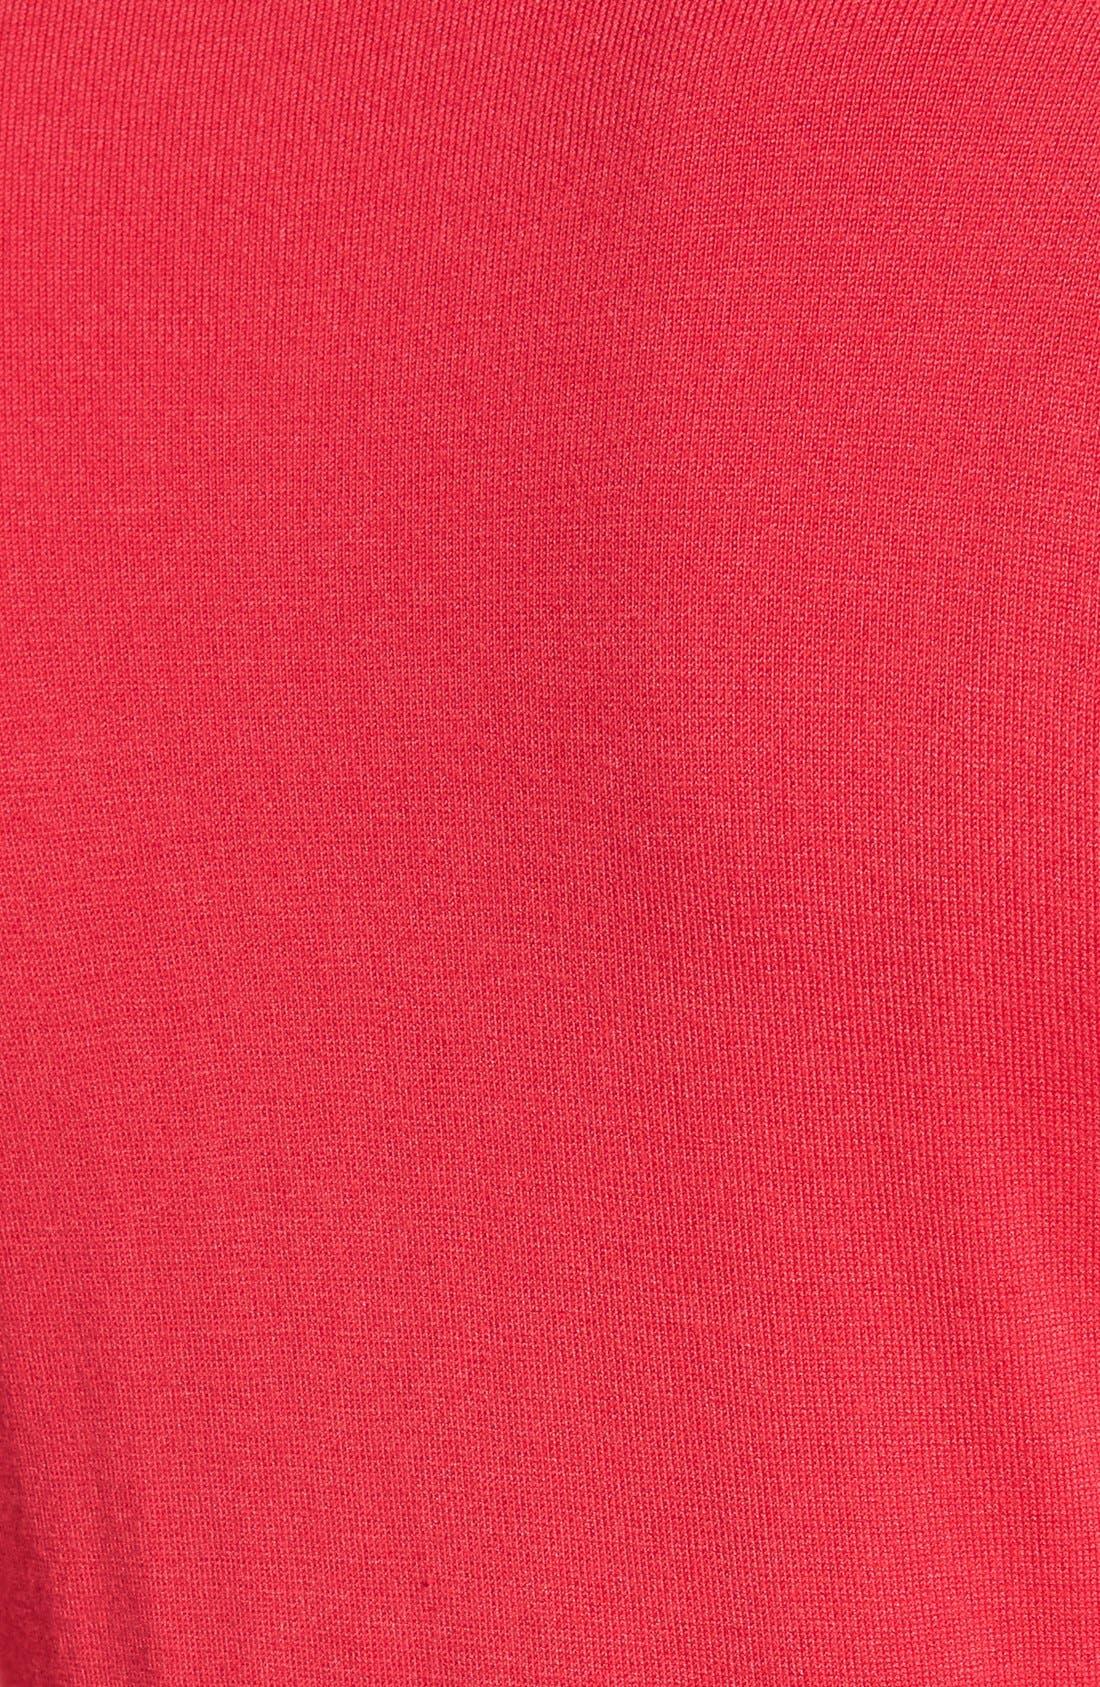 Three Quarter Sleeve Cardigan,                             Alternate thumbnail 103, color,